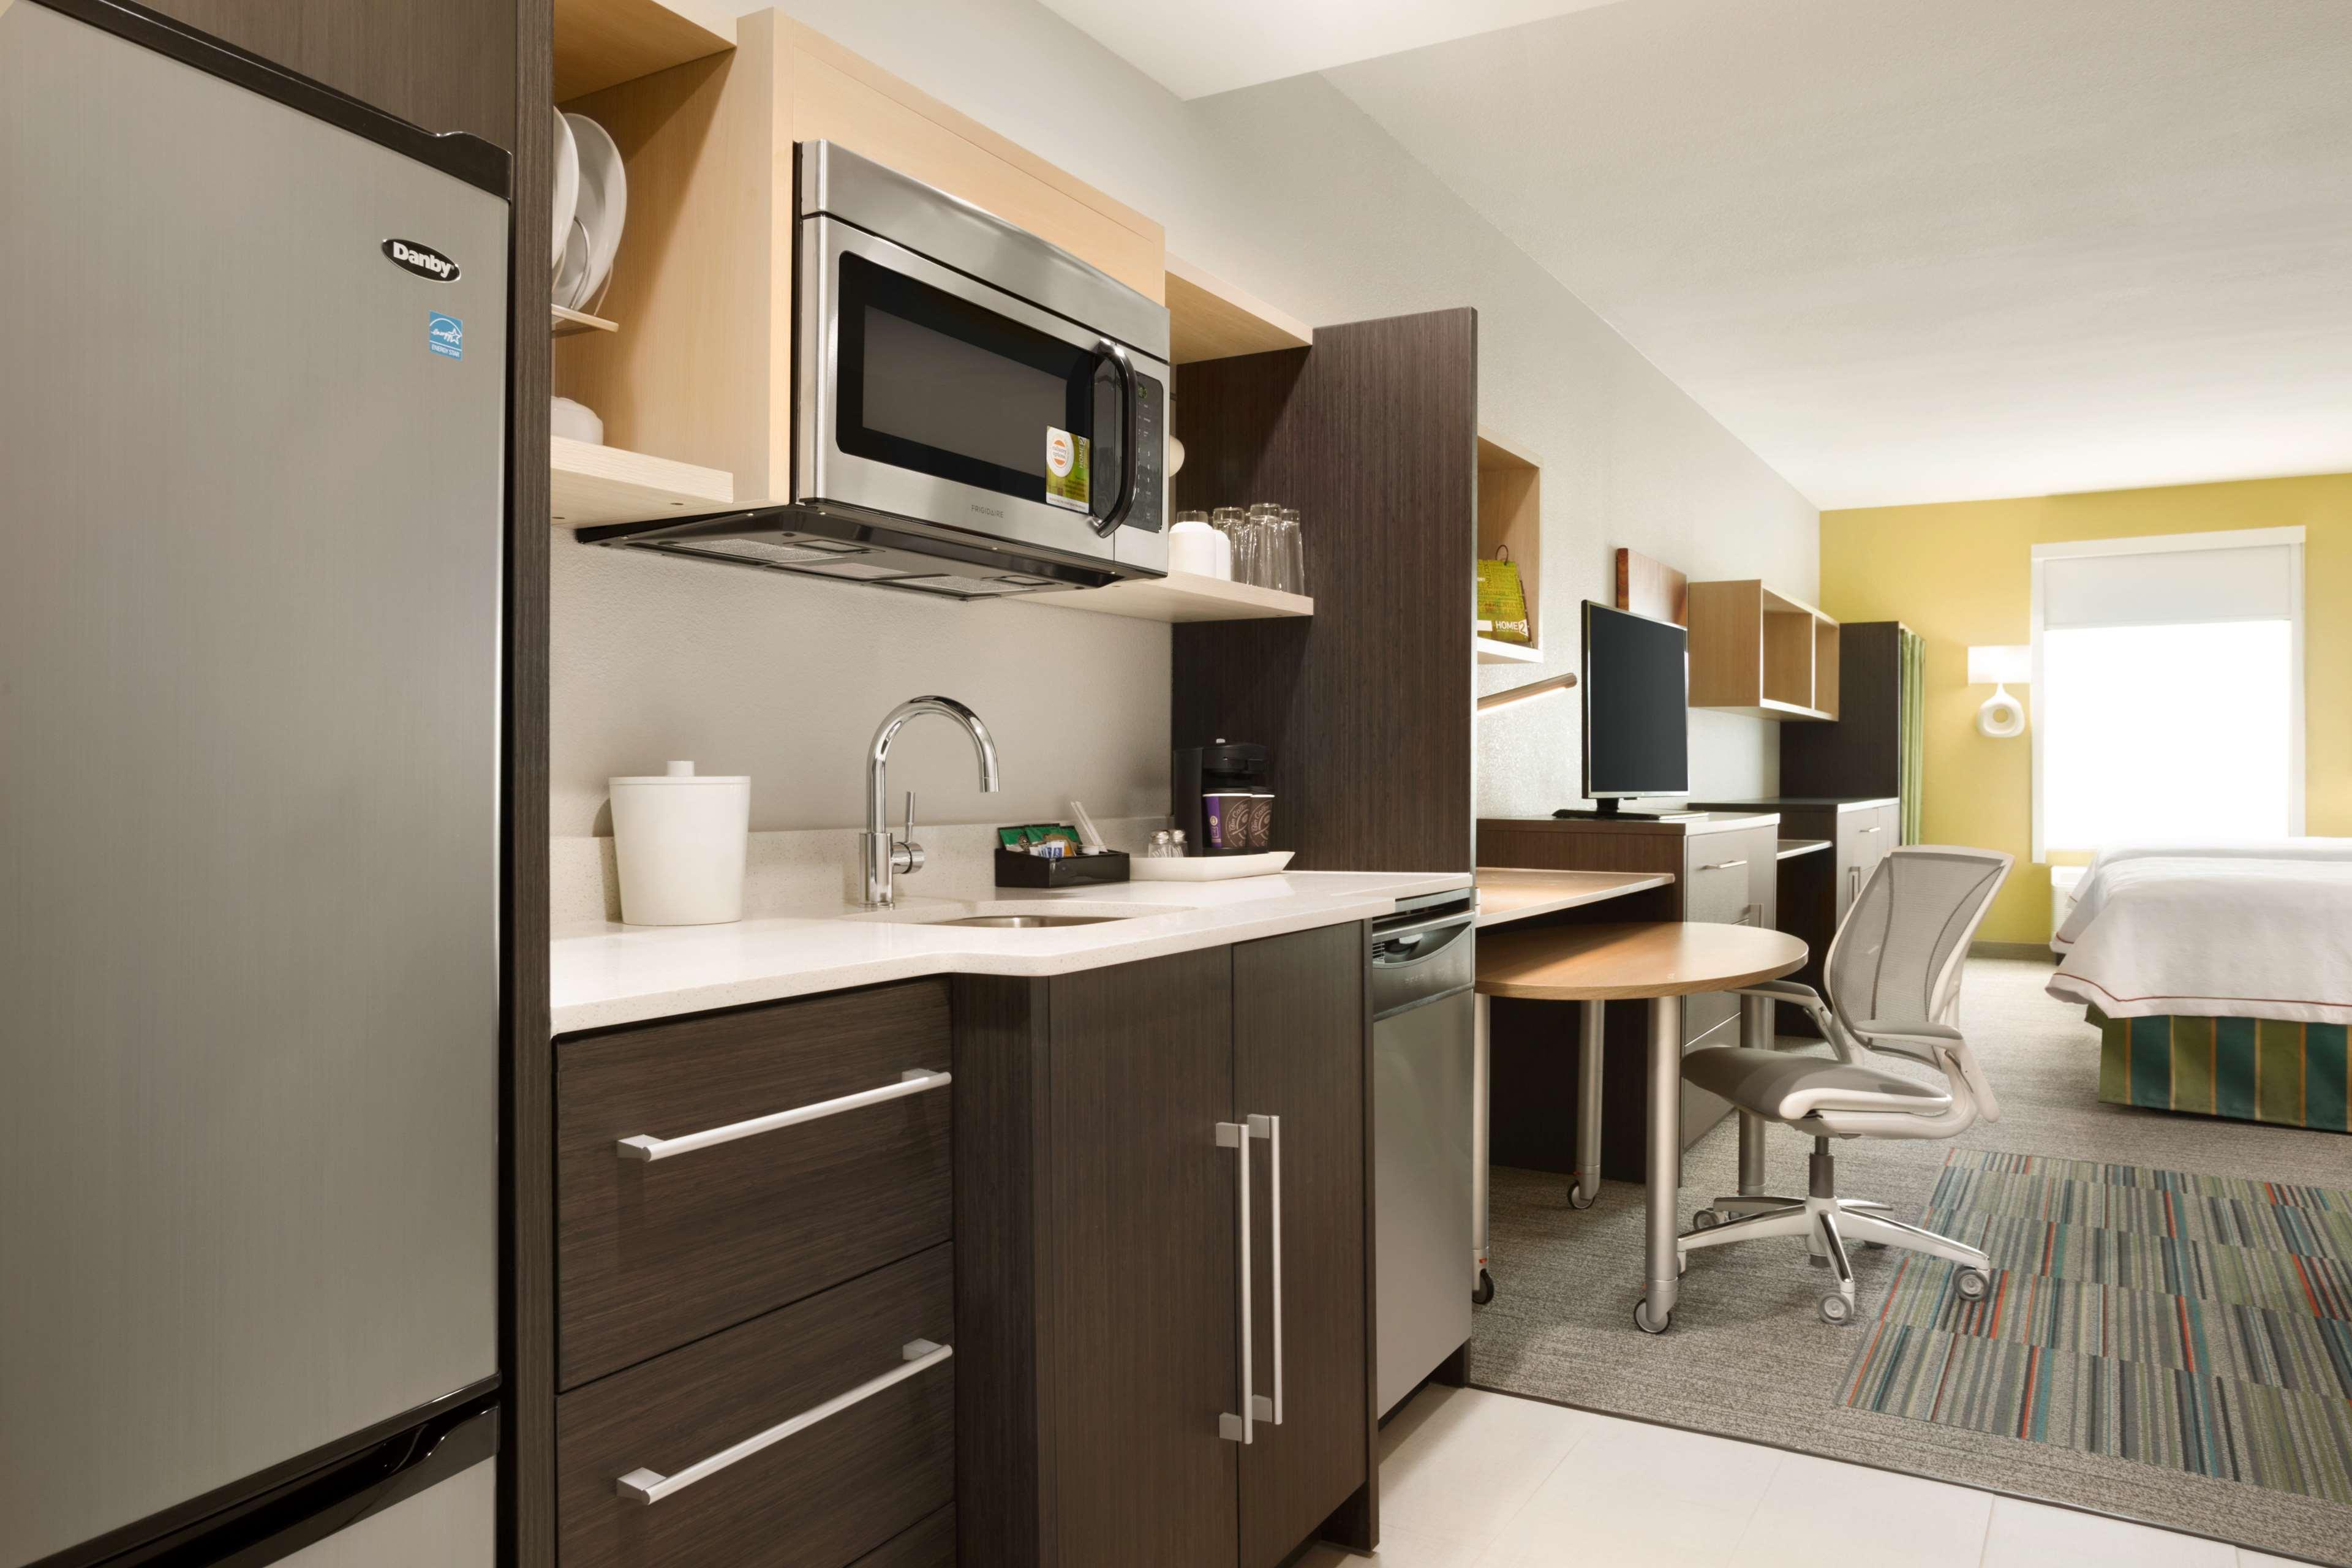 Home2 Suites by Hilton Houston/Webster image 19